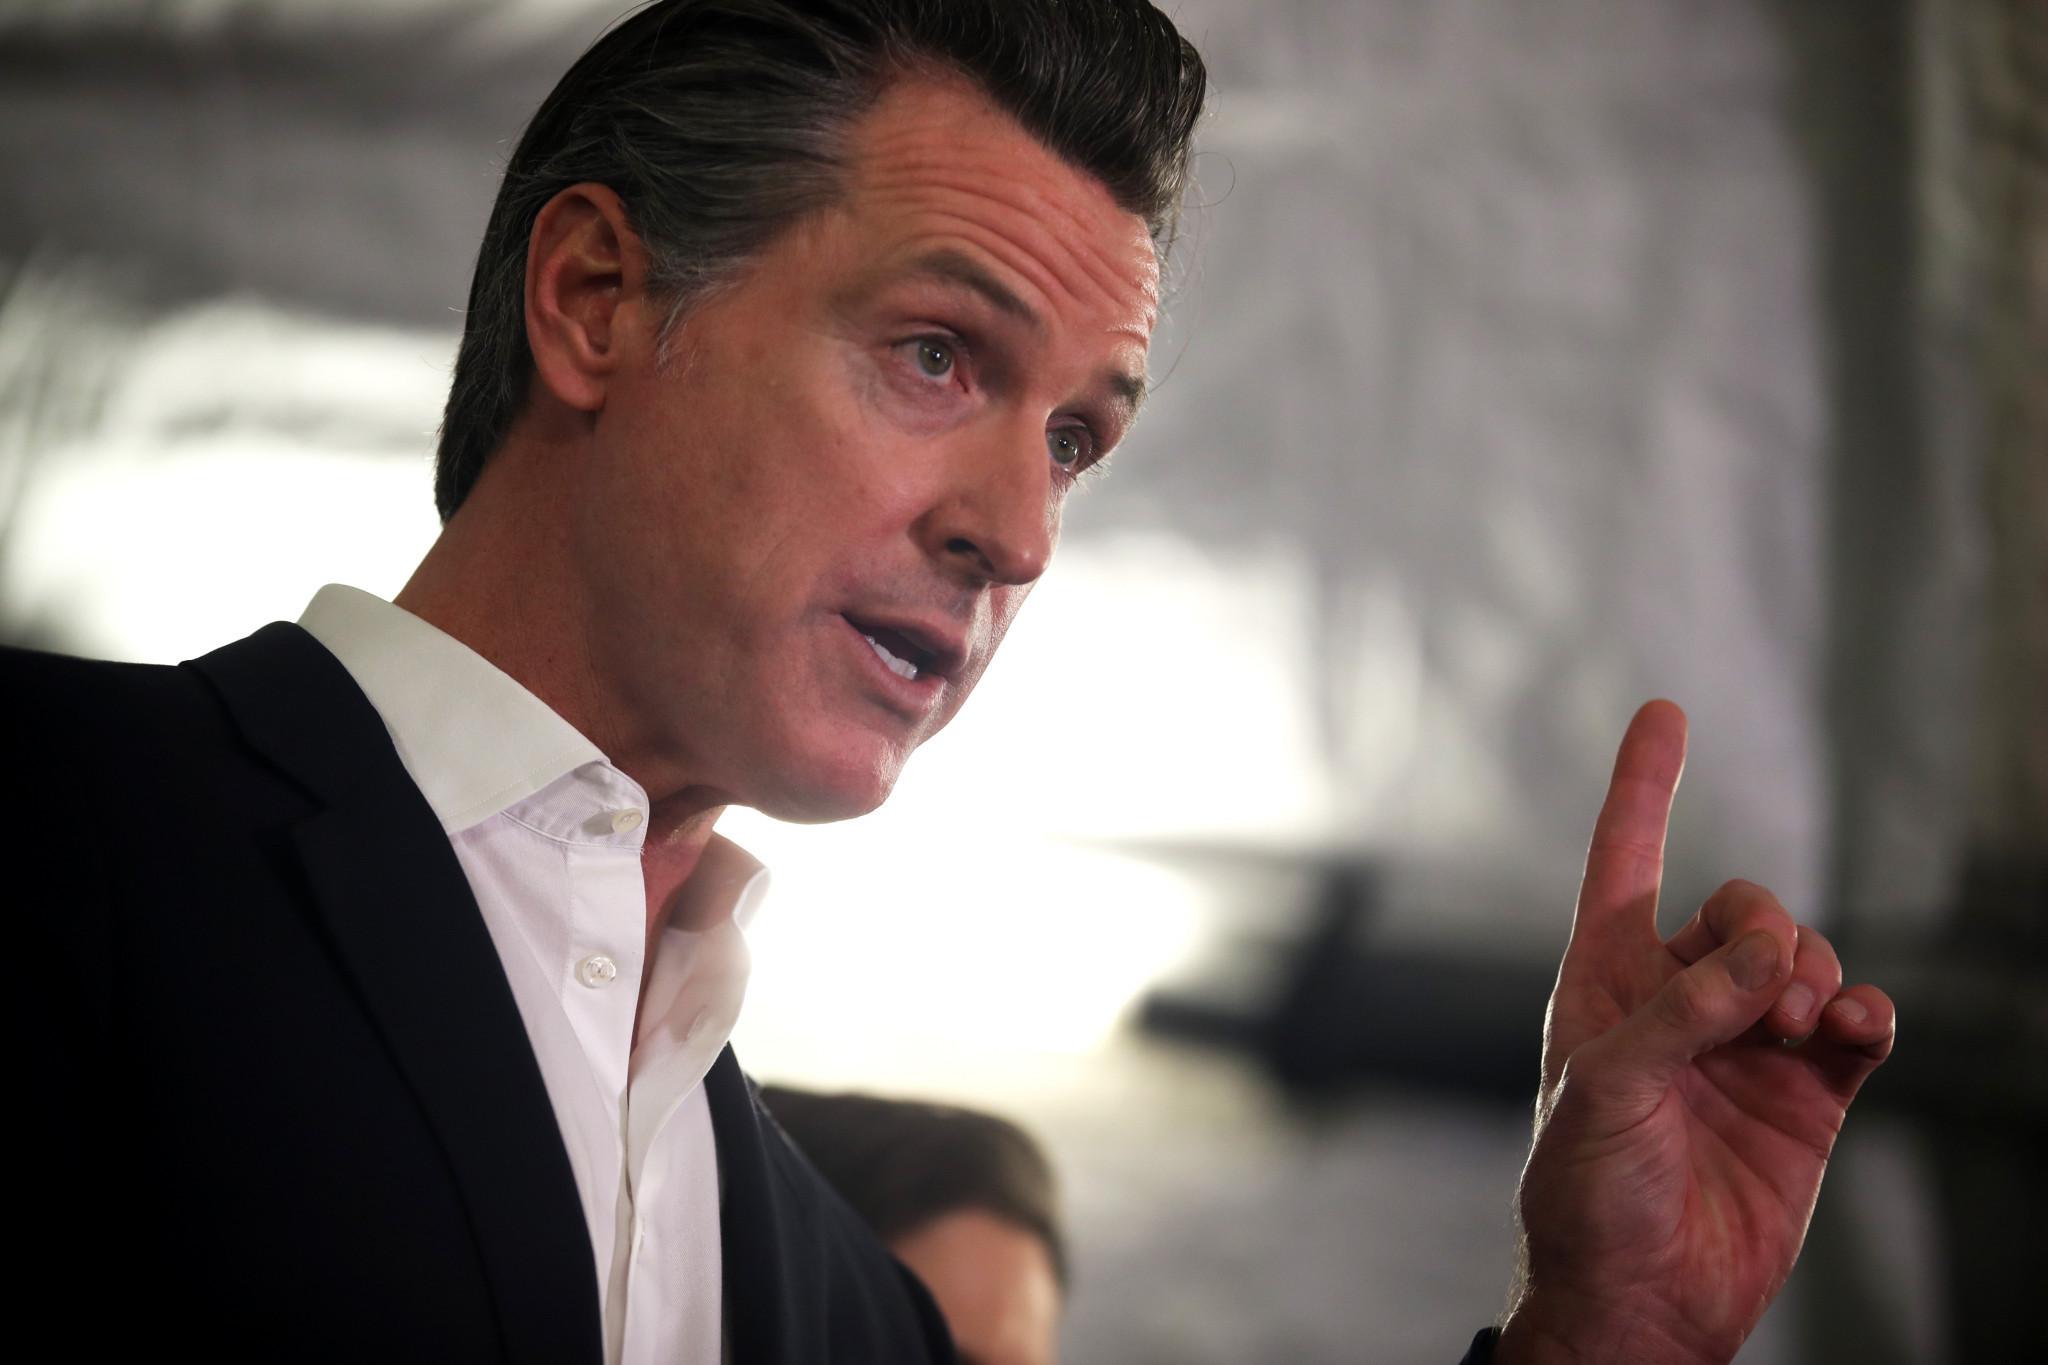 California Governor Newsom says COVID-19 vaccine needed to fill stadiums